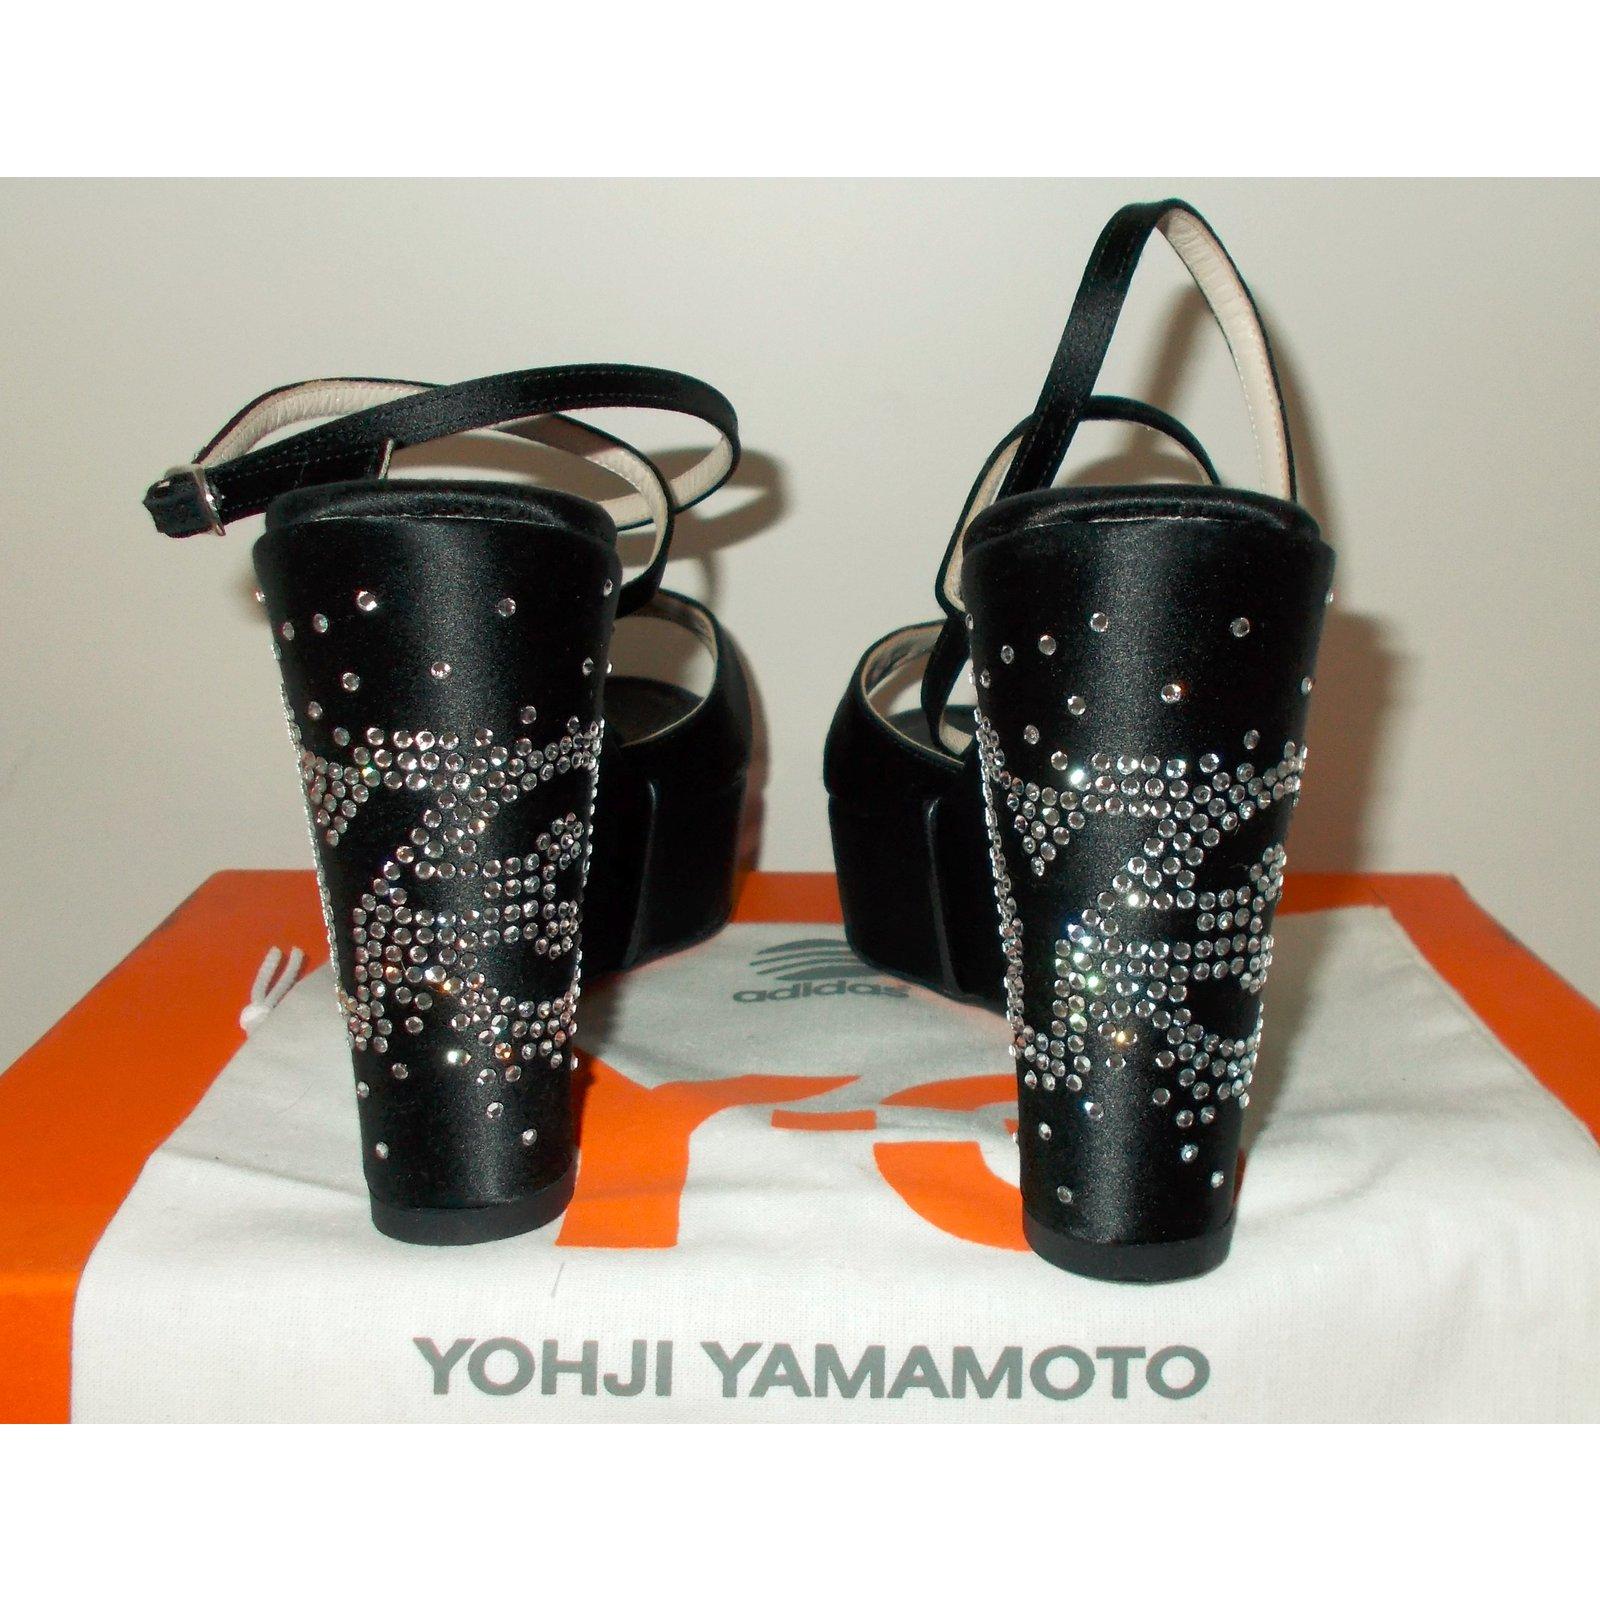 f26e69f071b8 Yohji Yamamoto Y-3 Yohji Yamamoto for Adidas Sandals Sandals Leather ...